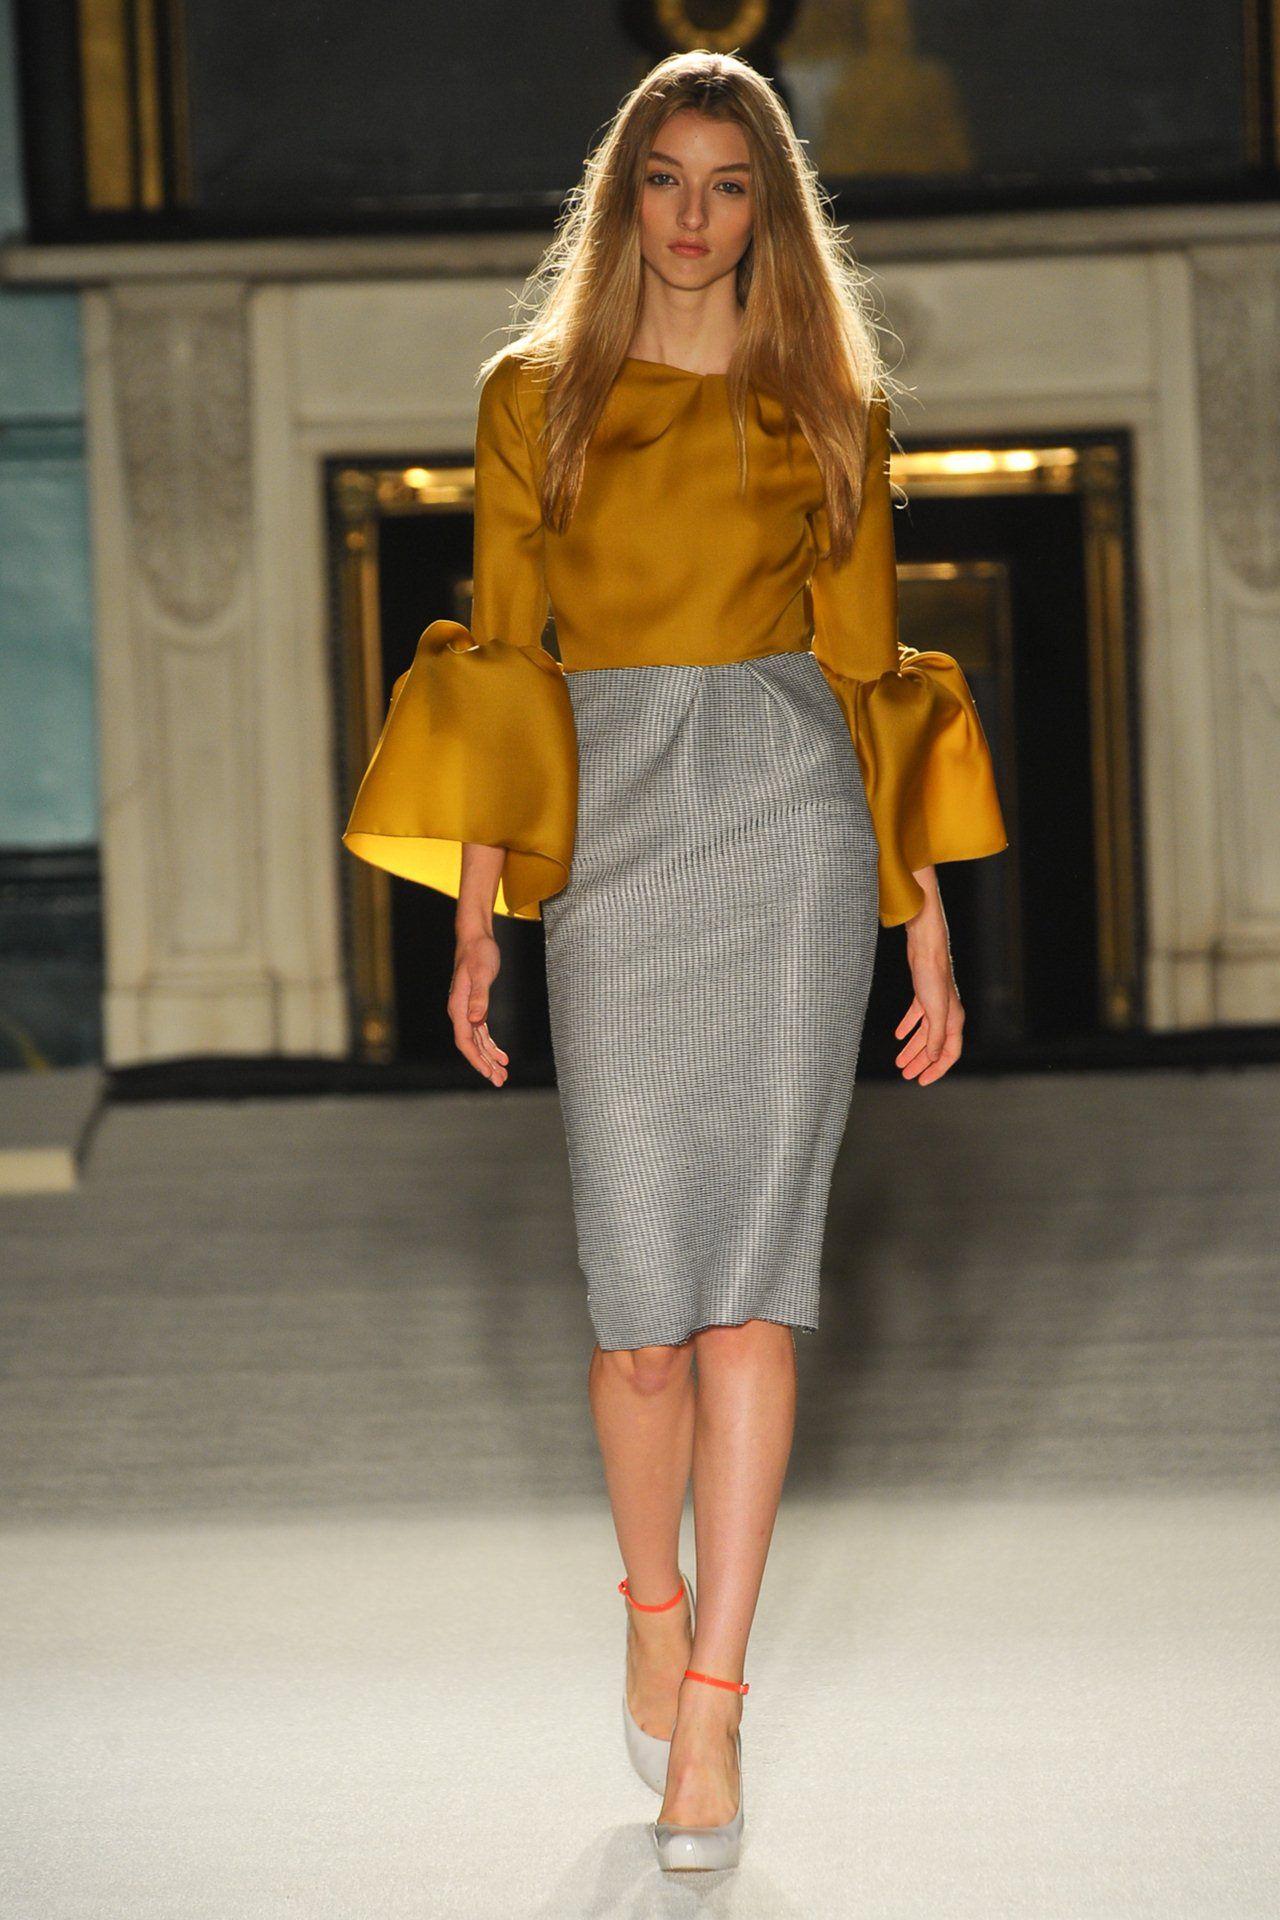 Roksanda Ilincic puffed sleeves unusual long sleeves pencil skirt sophisticated and smart ...